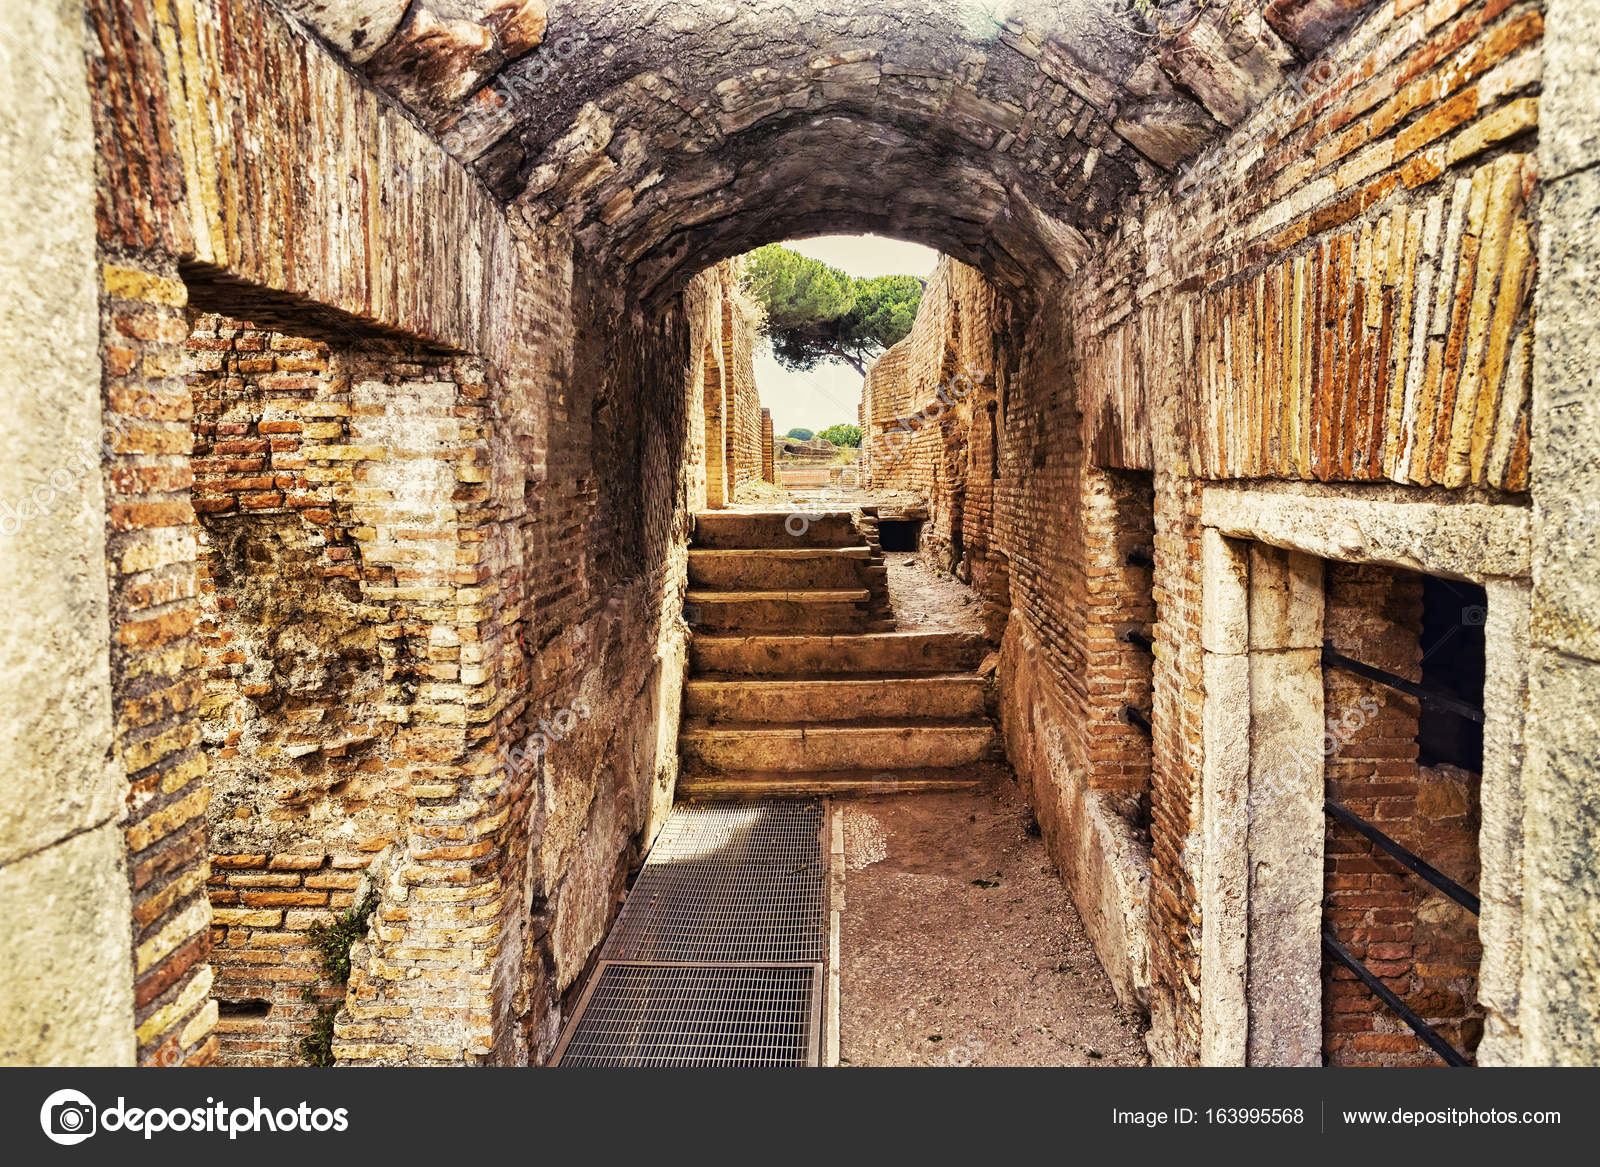 Scavi archeologici di ostia antica all 39 interno di un for Interno 1 ostia